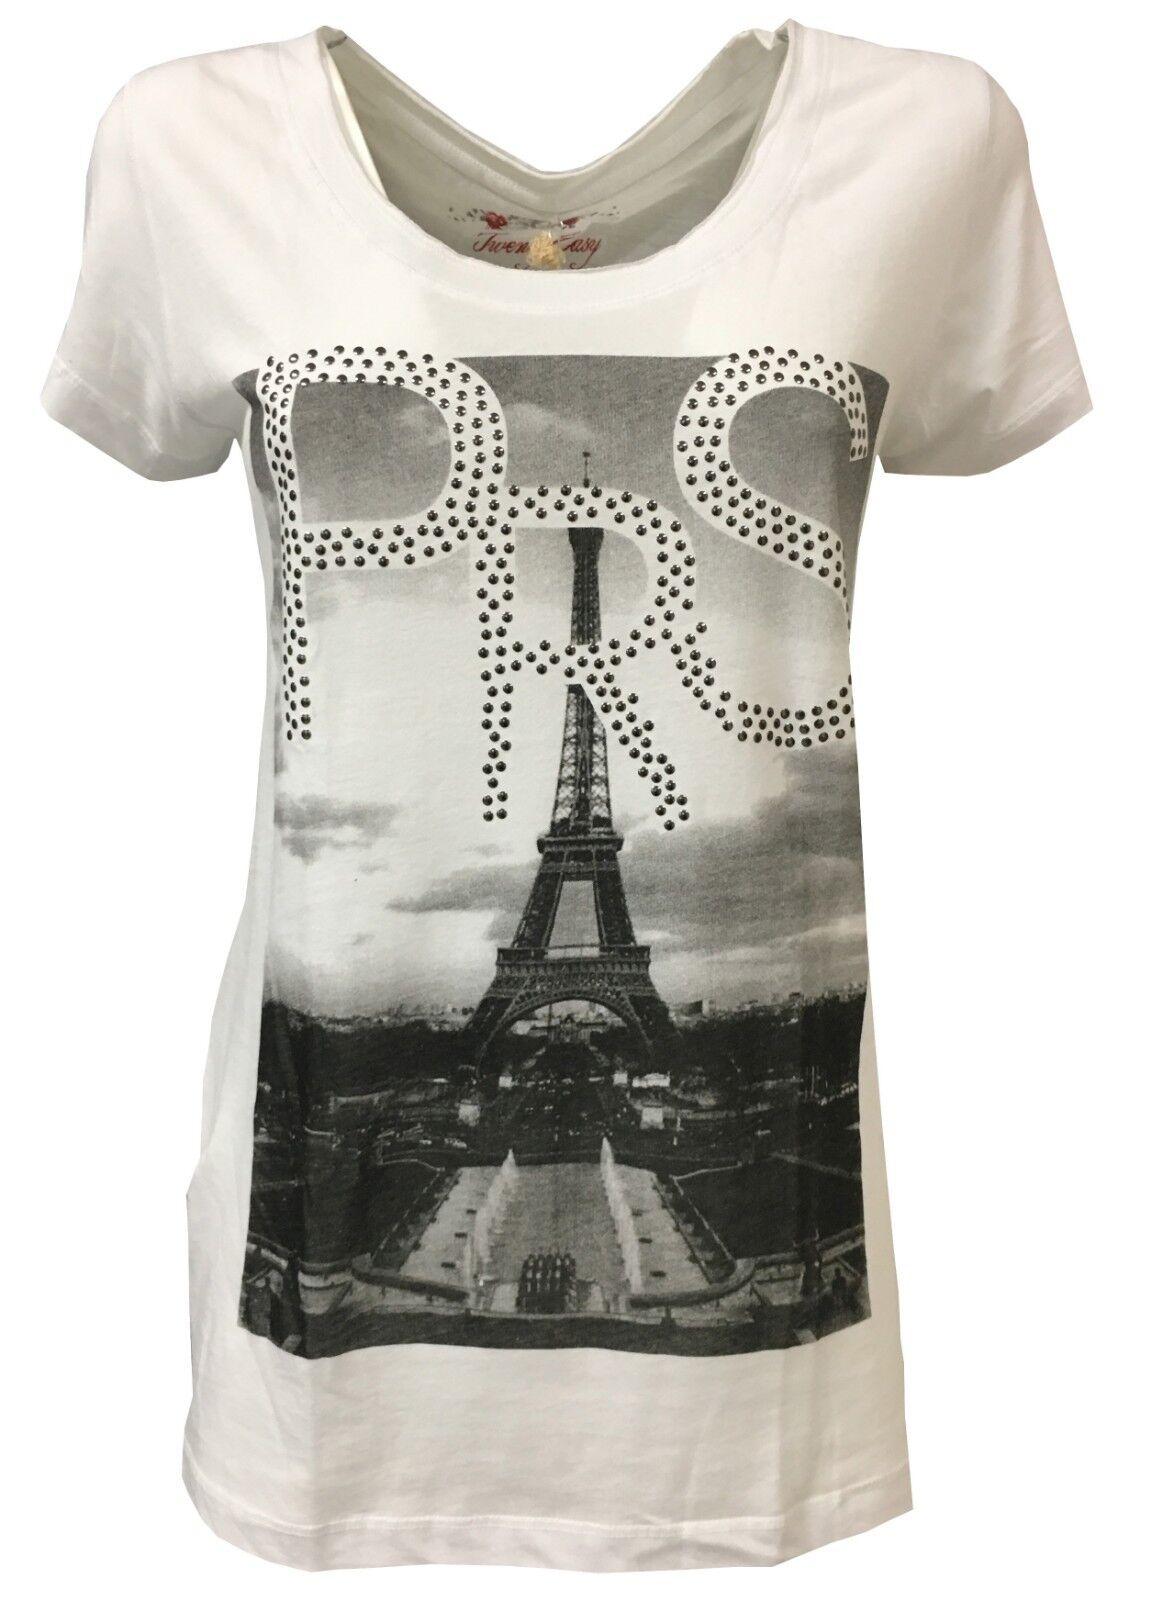 TWENTY EASY BY KAOS t-shirt donna mezza manica Bianca Made in